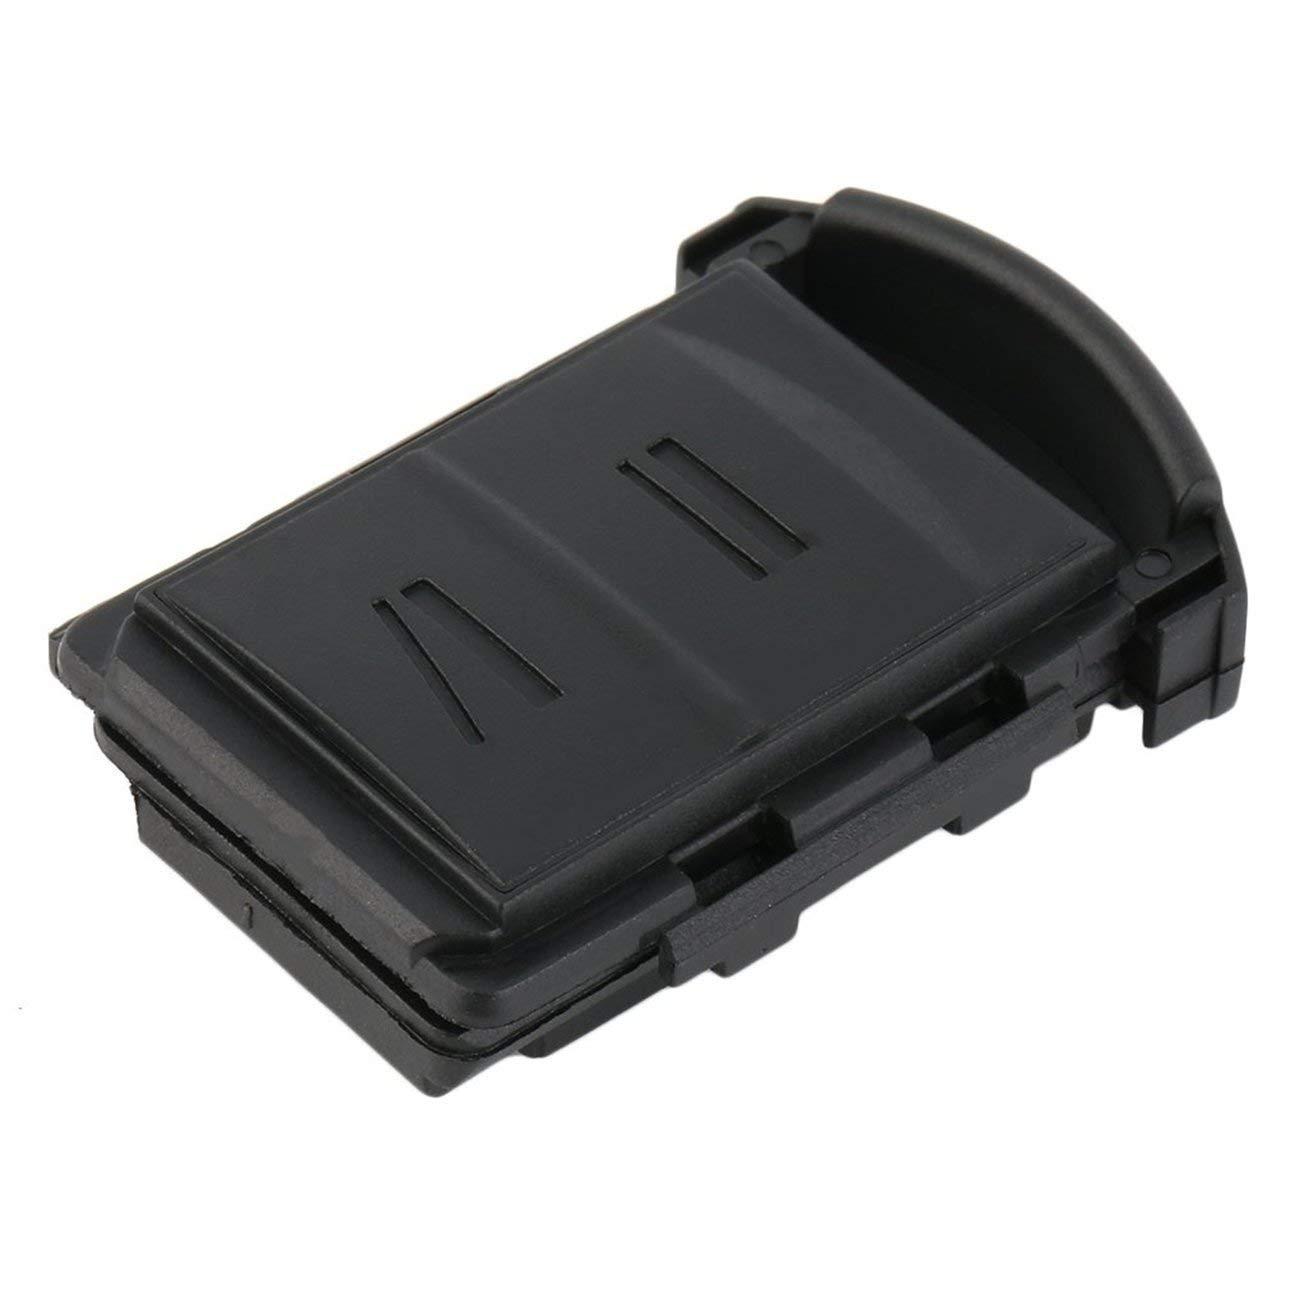 Liobaba Remote Key Shell Case Fob 2 Button Vauxhall Opel Agila Tigra Corsa C New